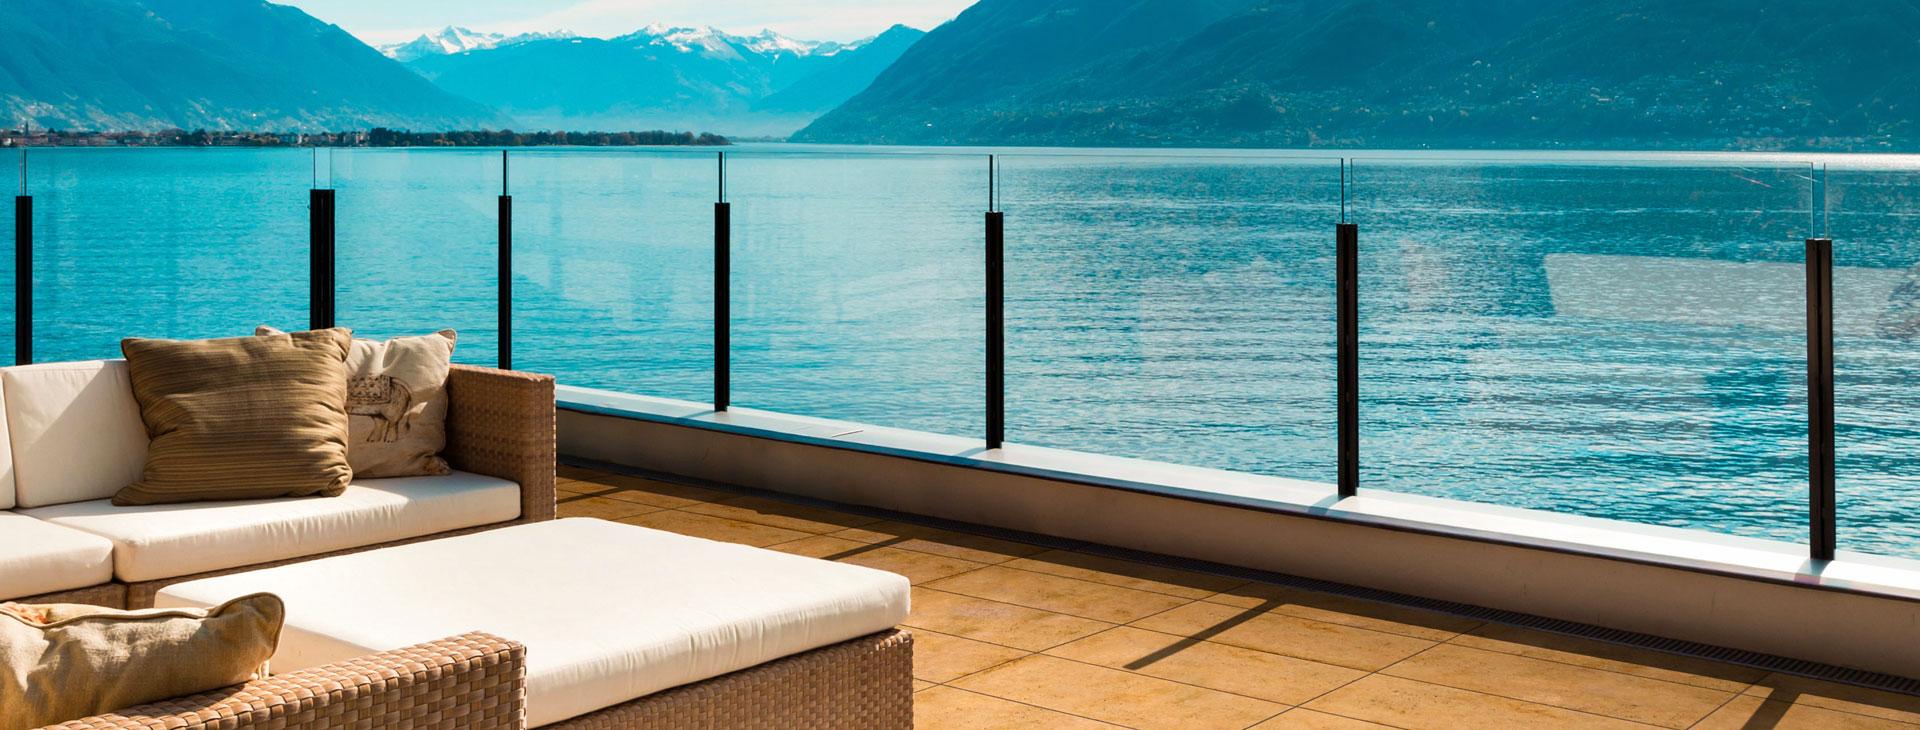 balkon_terrasse02.jpg